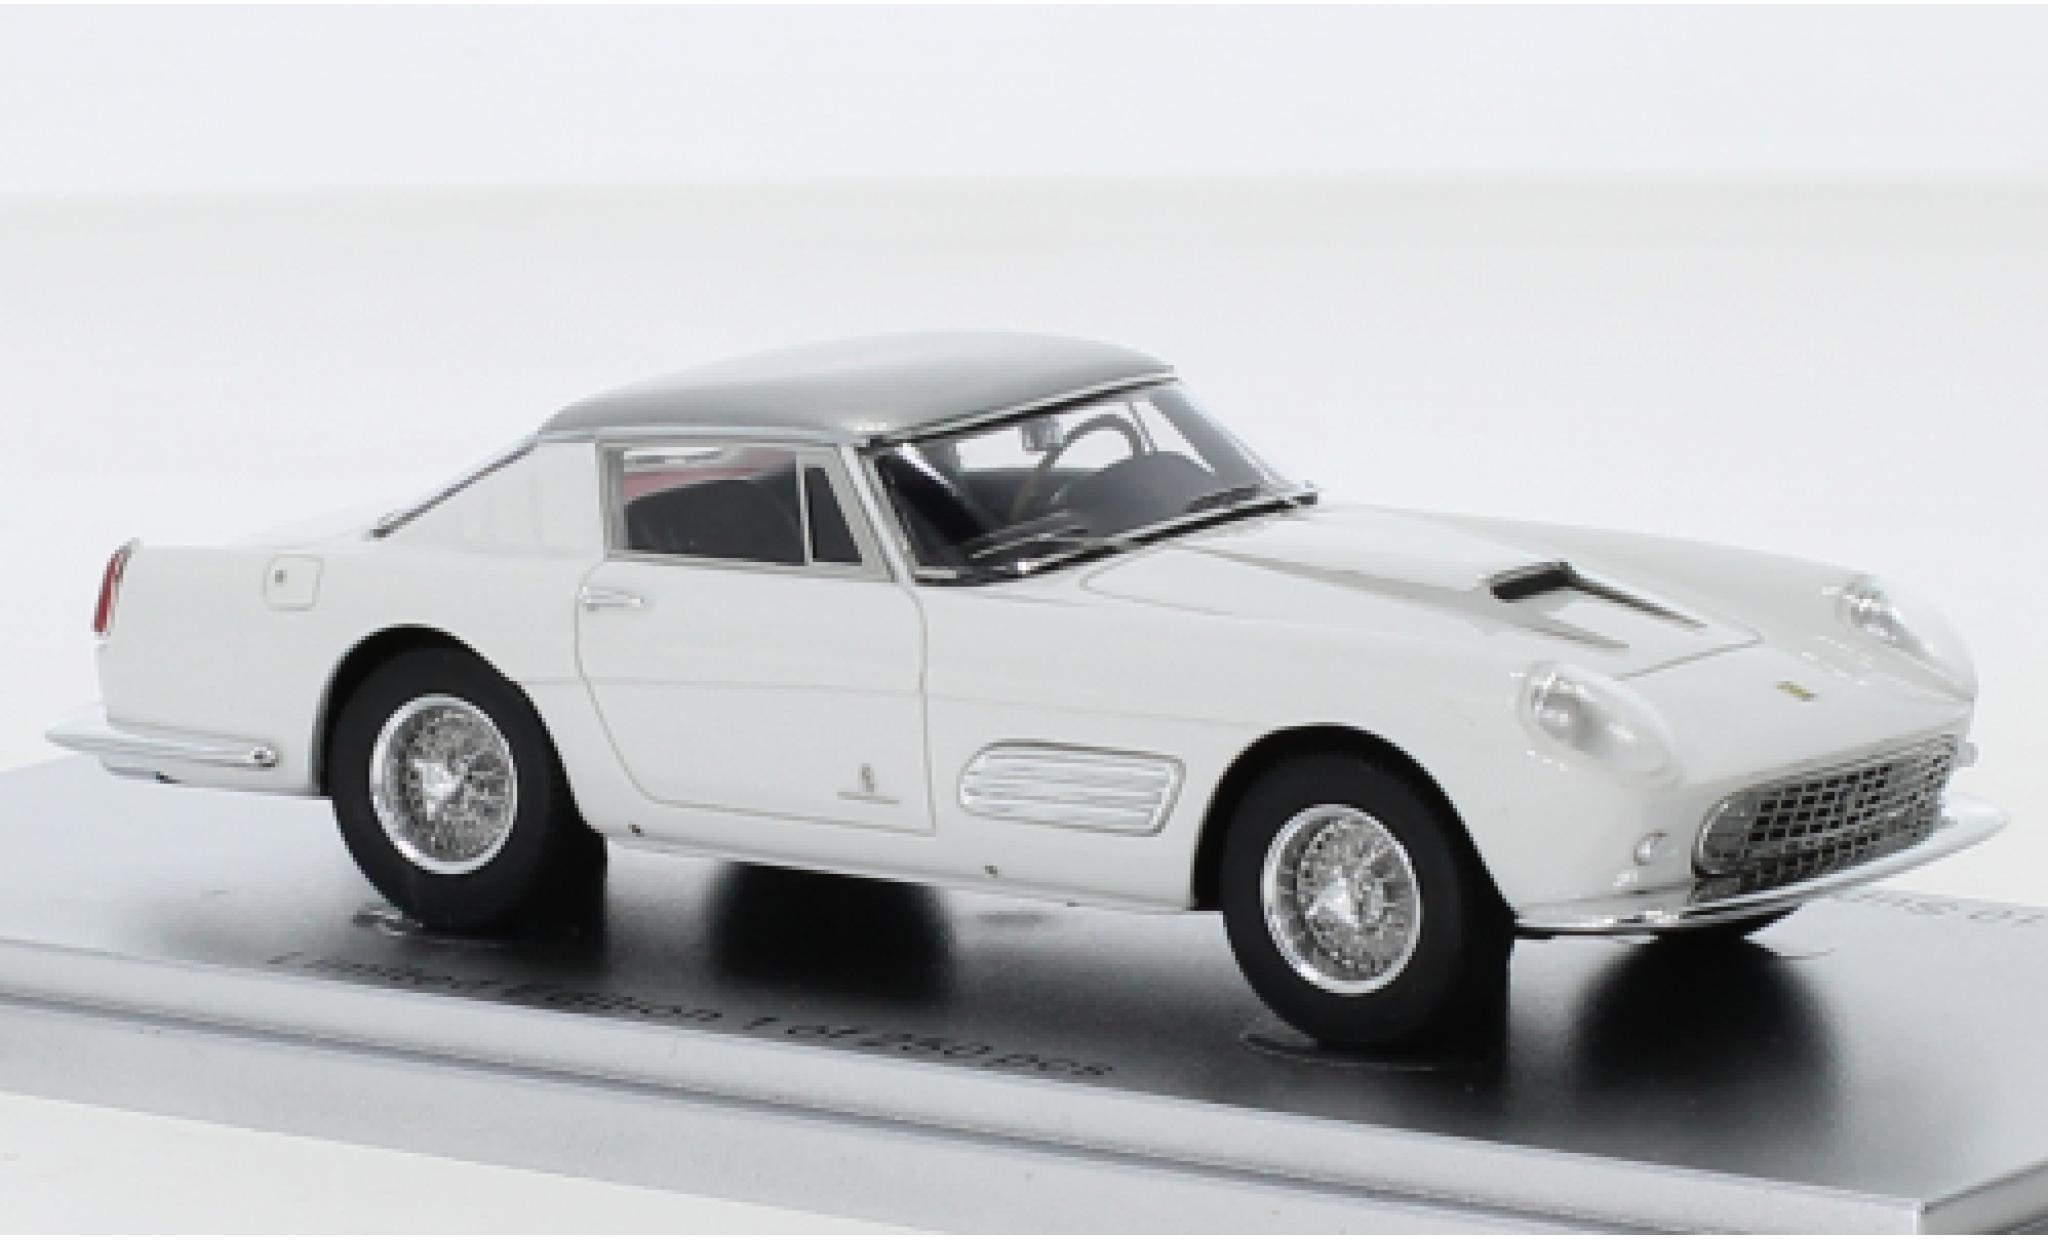 Ferrari 410 1/43 Kess Superamerica Series III Pininfarina Coupe white/grey 1958